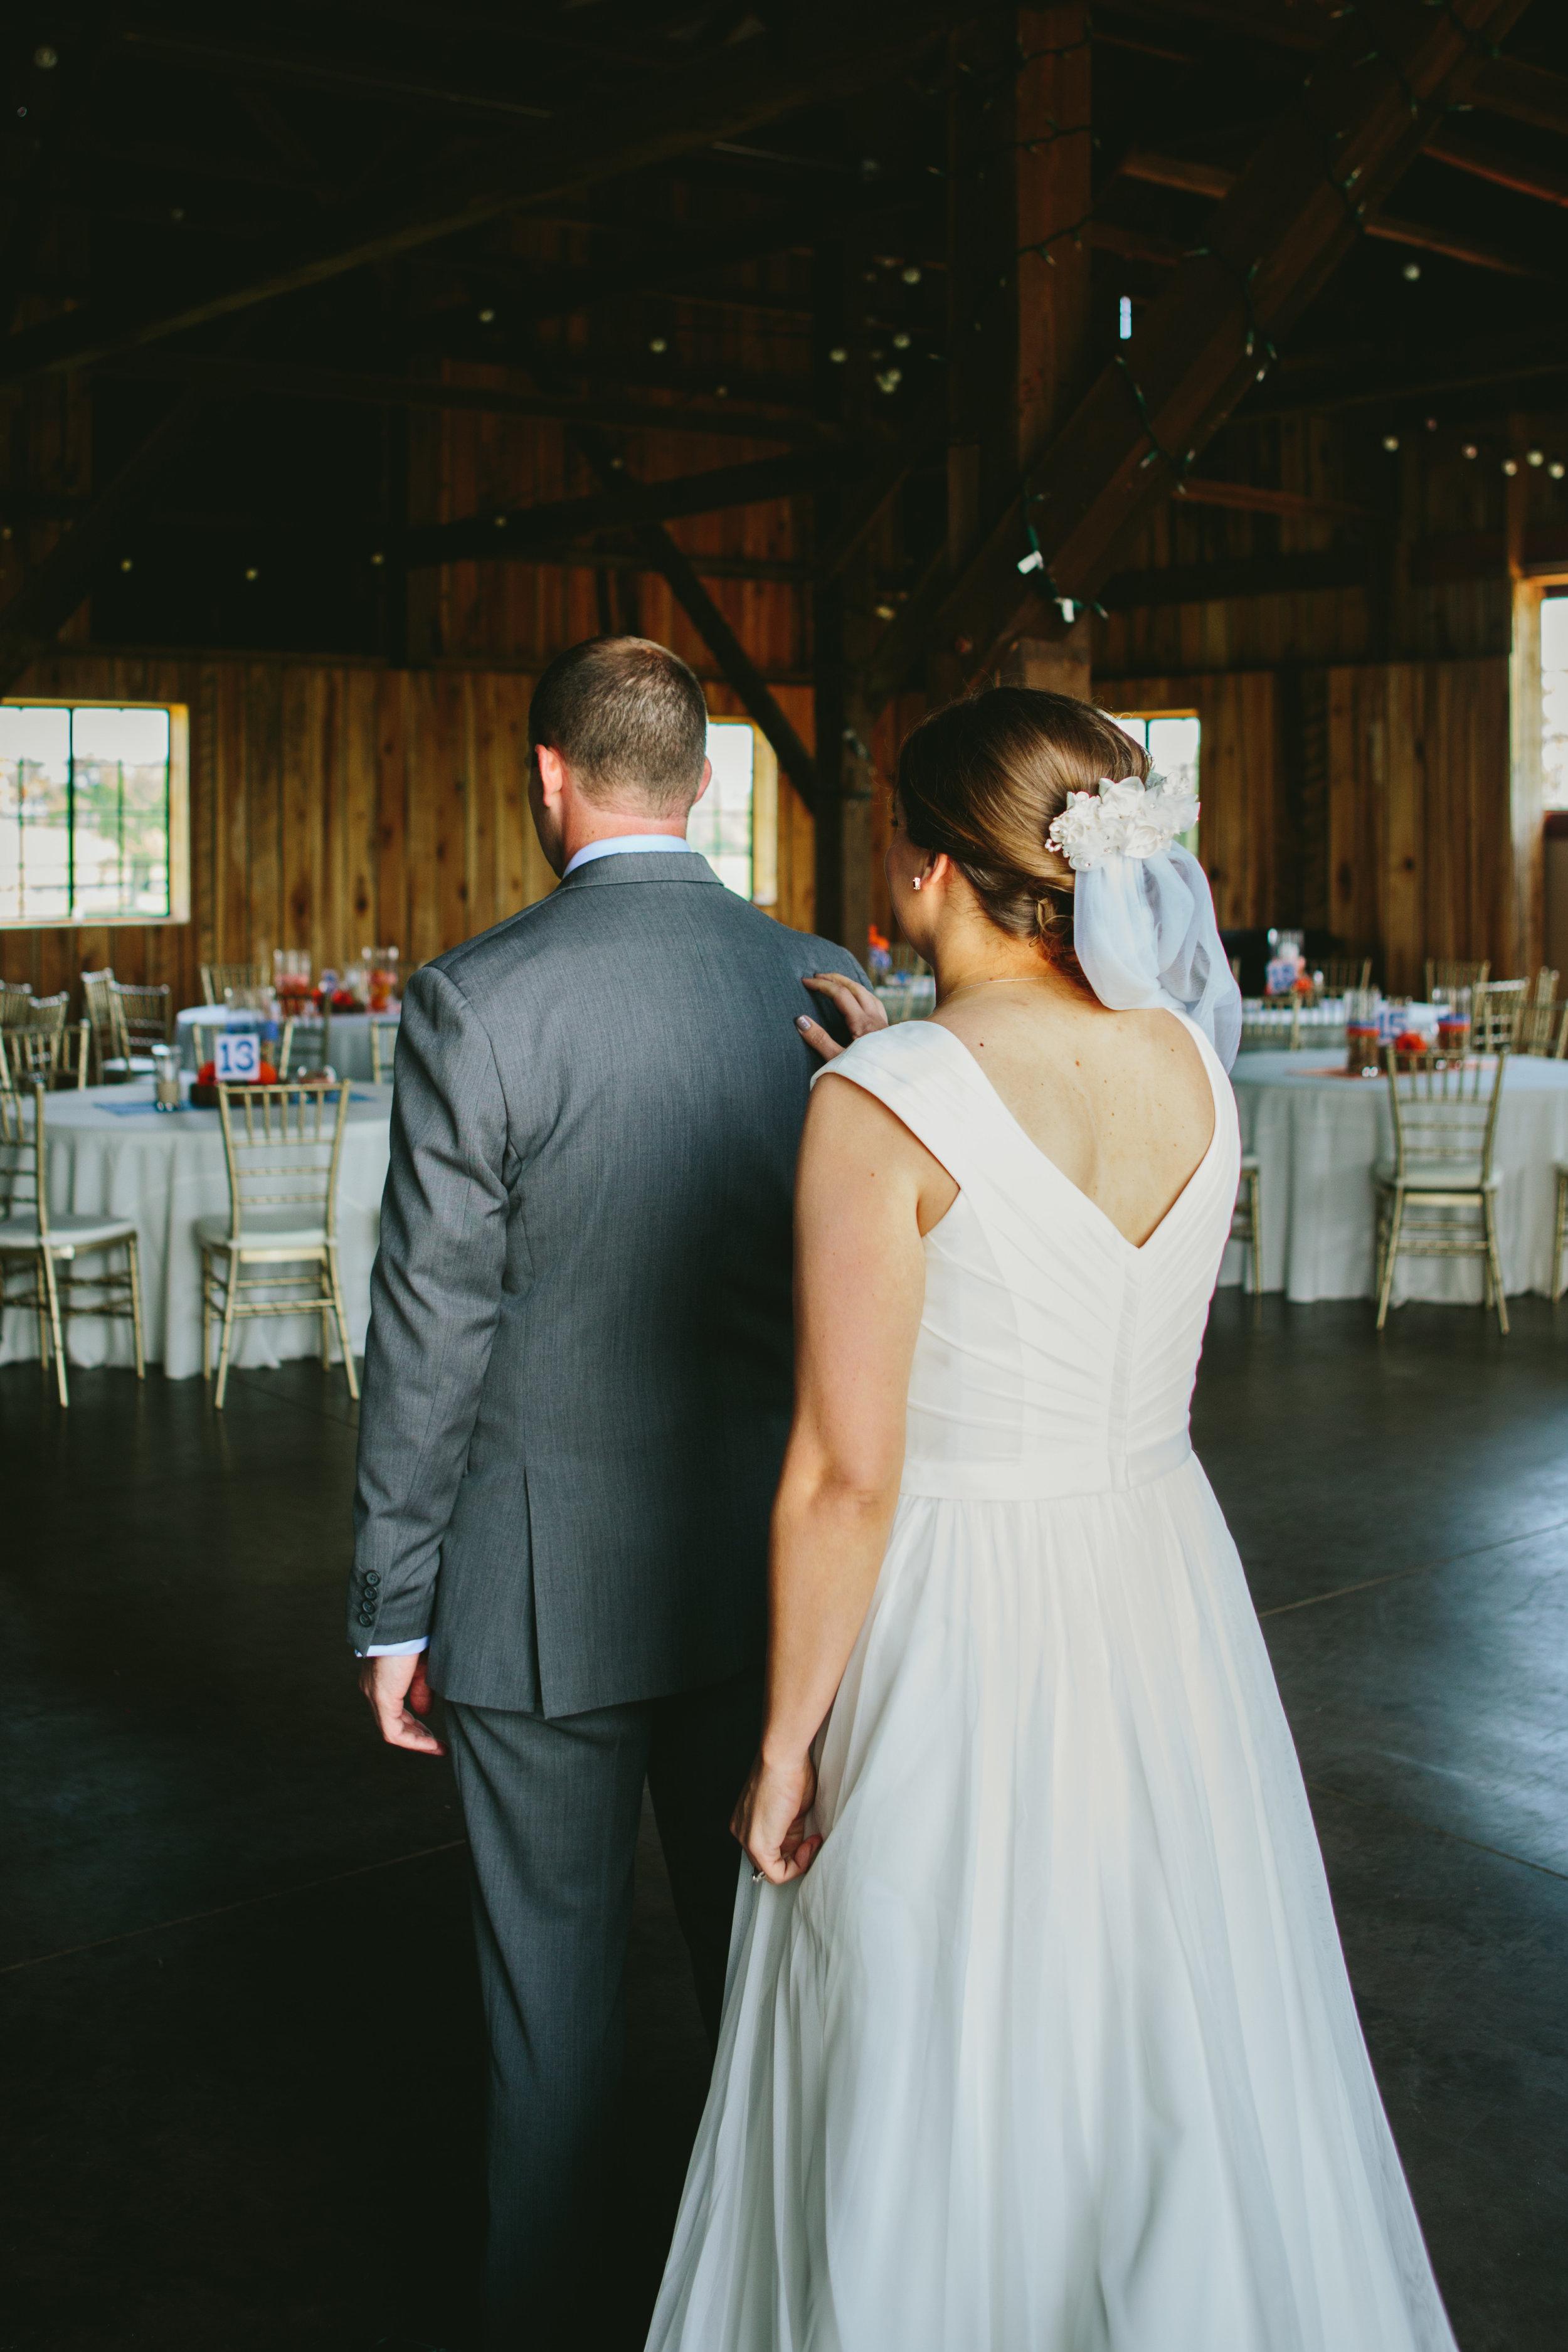 Whitesell-Mattioda Wedding-165.jpg